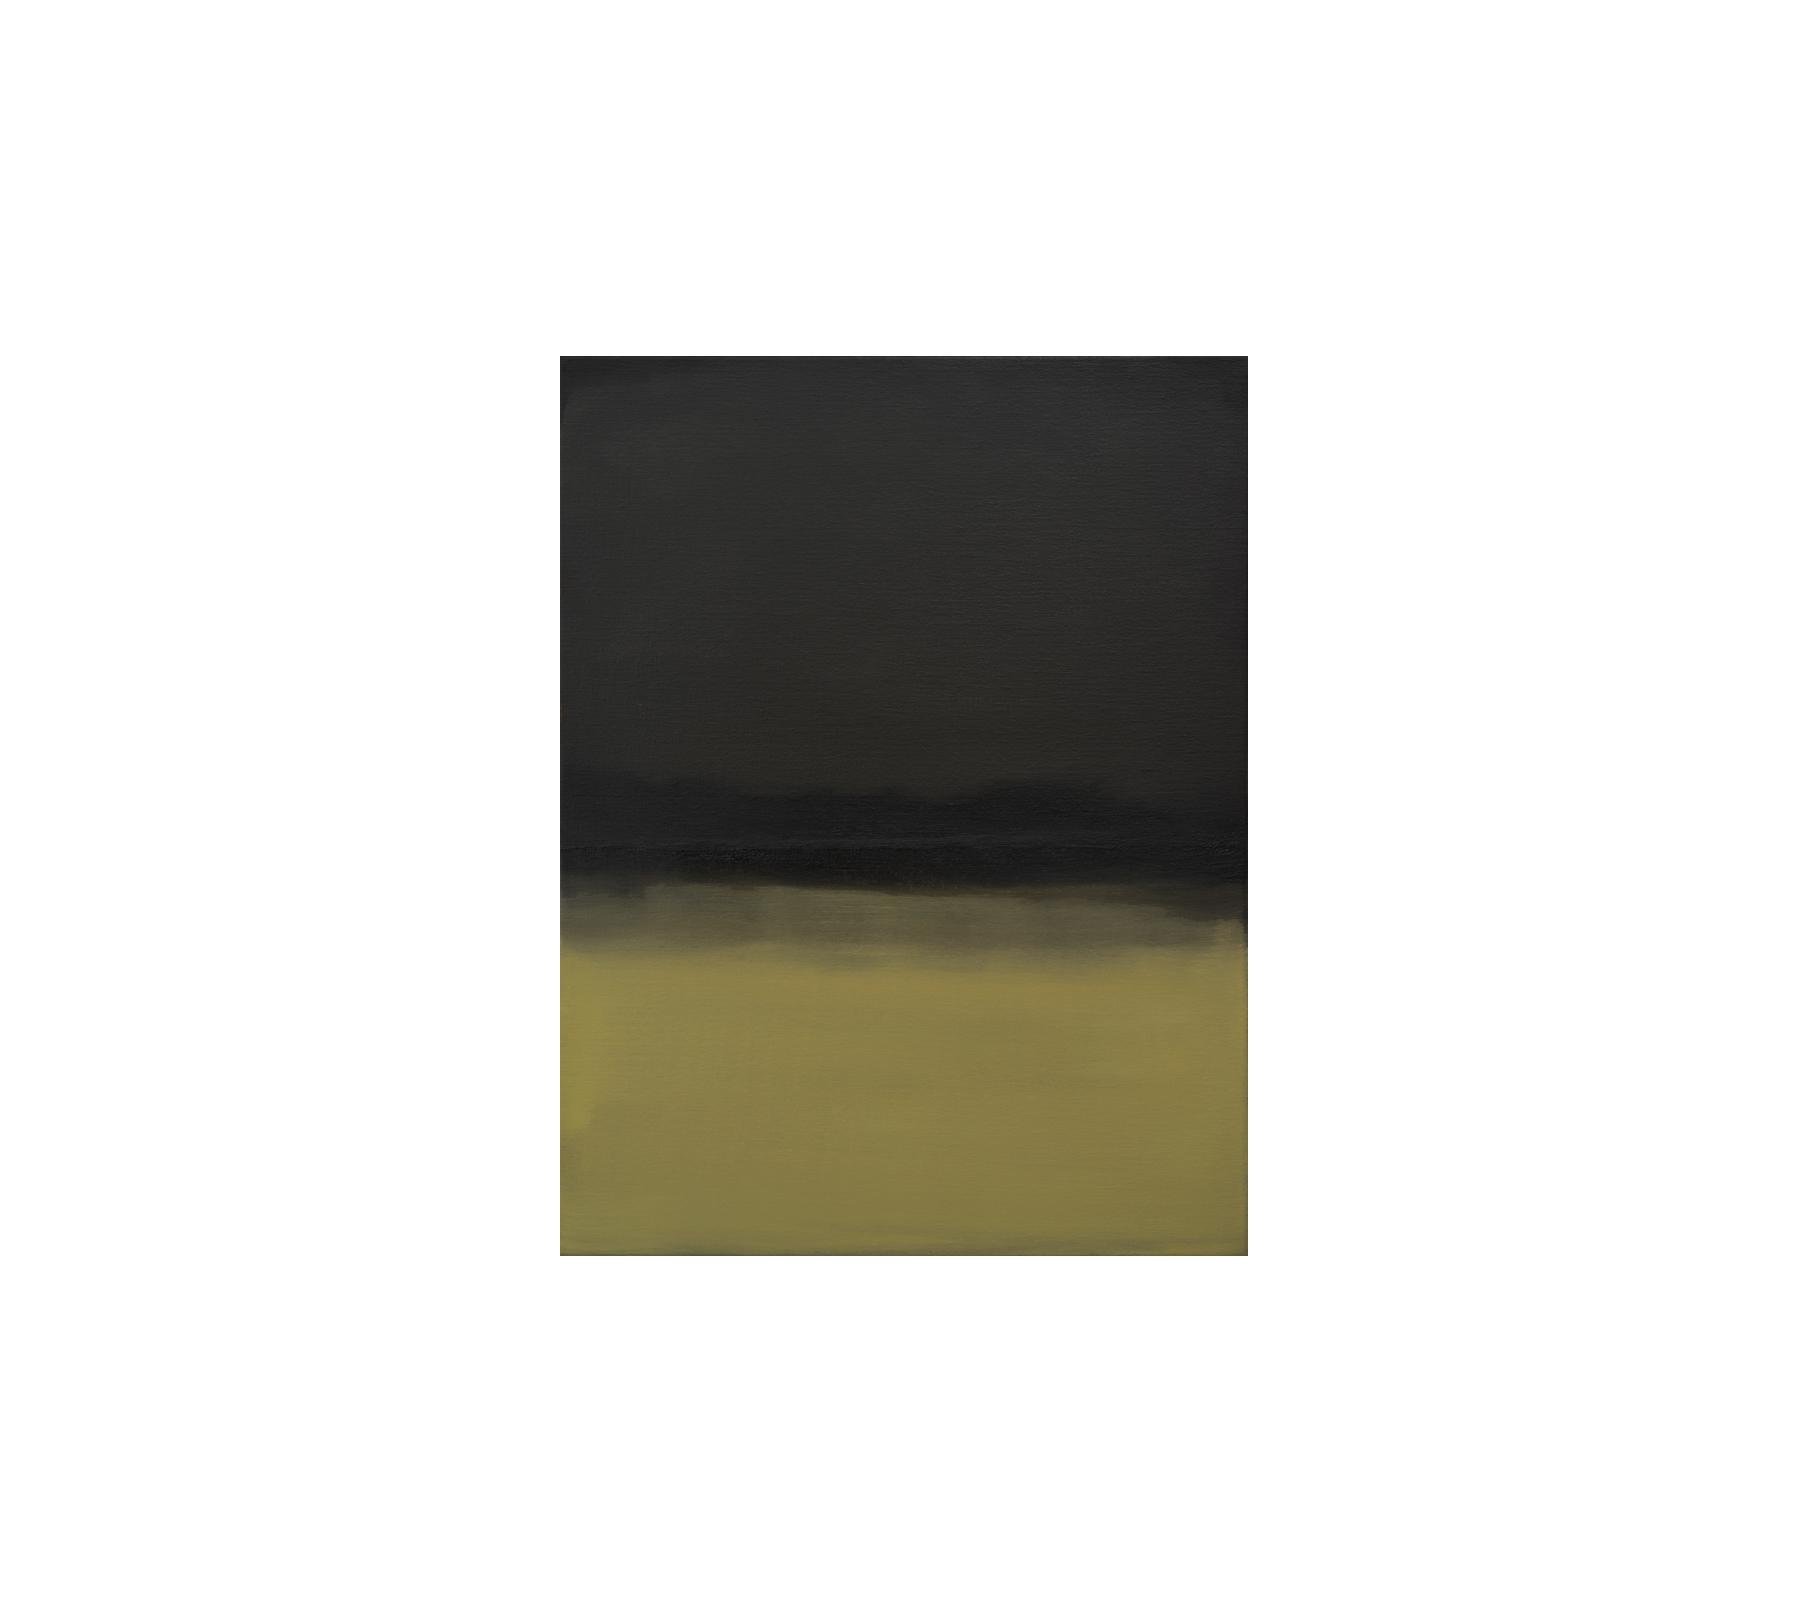 Untitled 2021 70x50cm